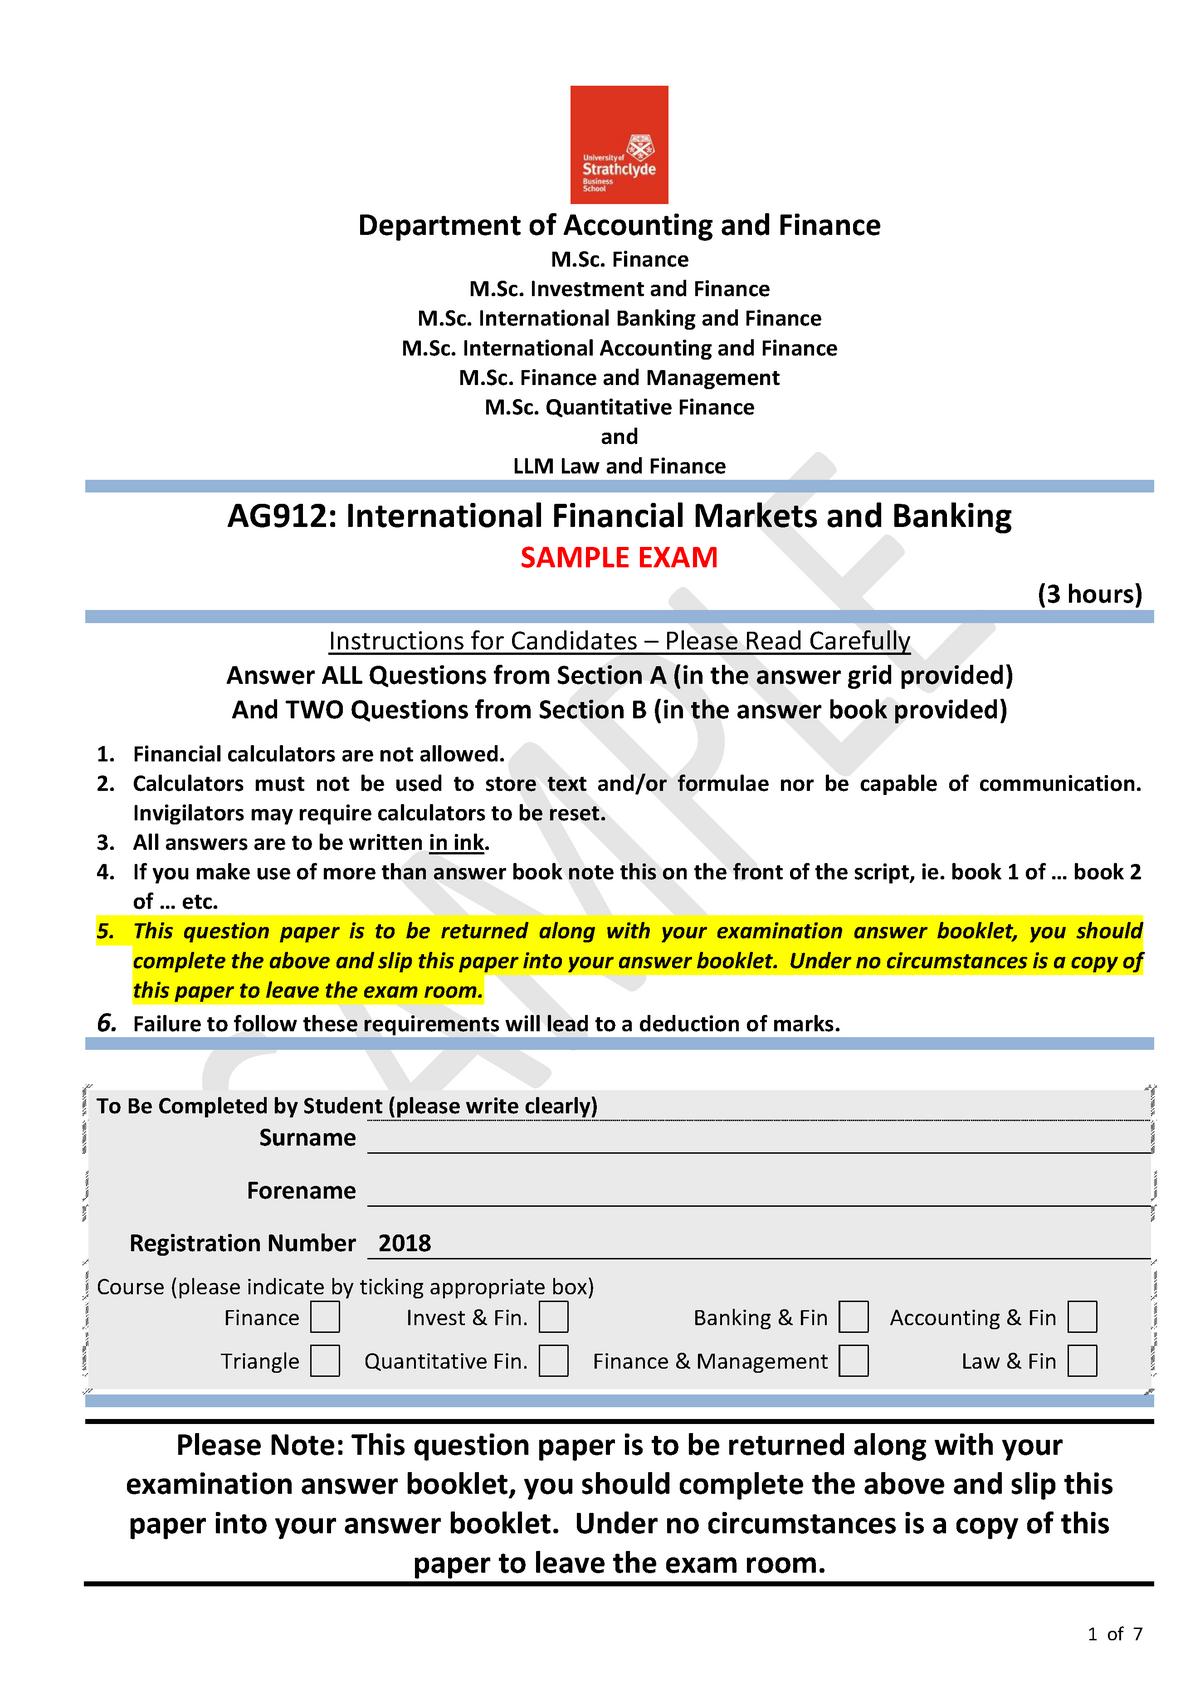 Exam 2018 - AG912: International Financial Markets And